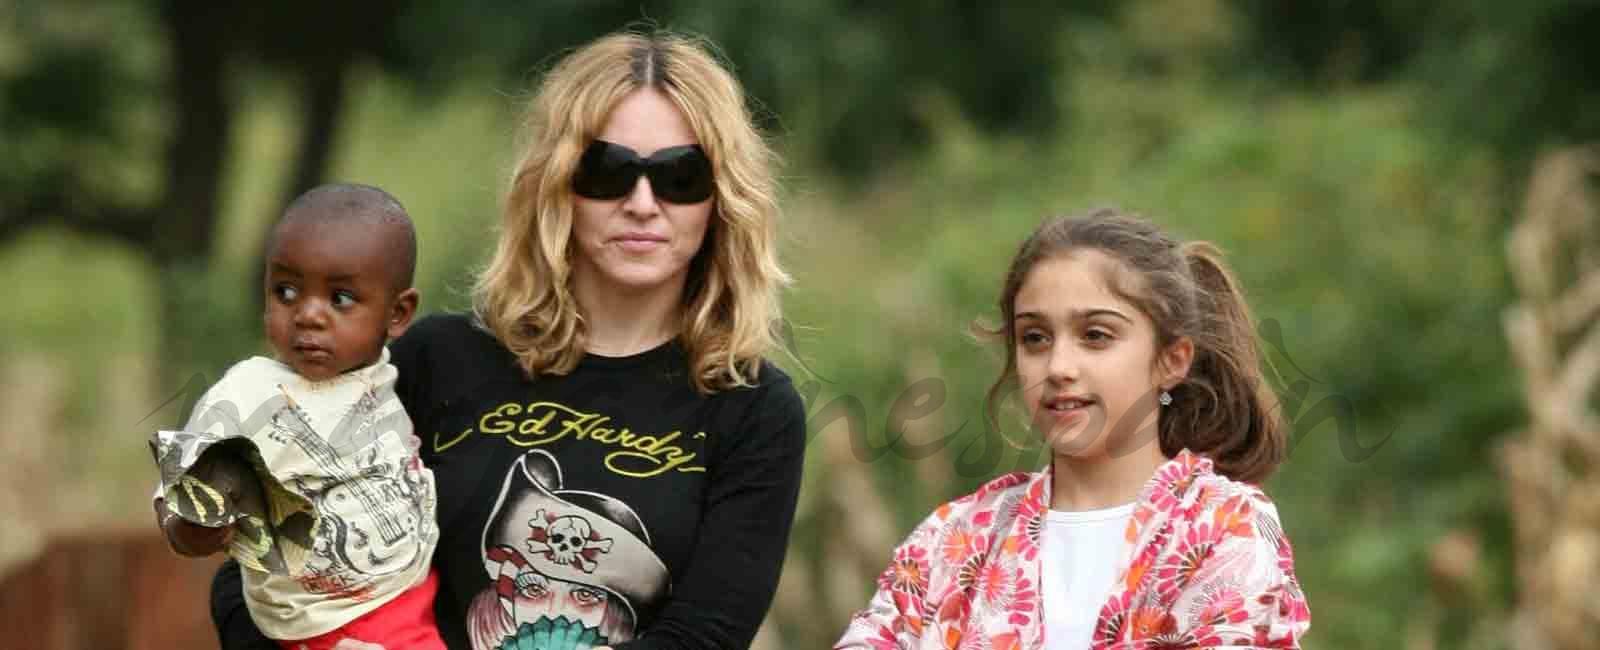 Madonna una madre feliz